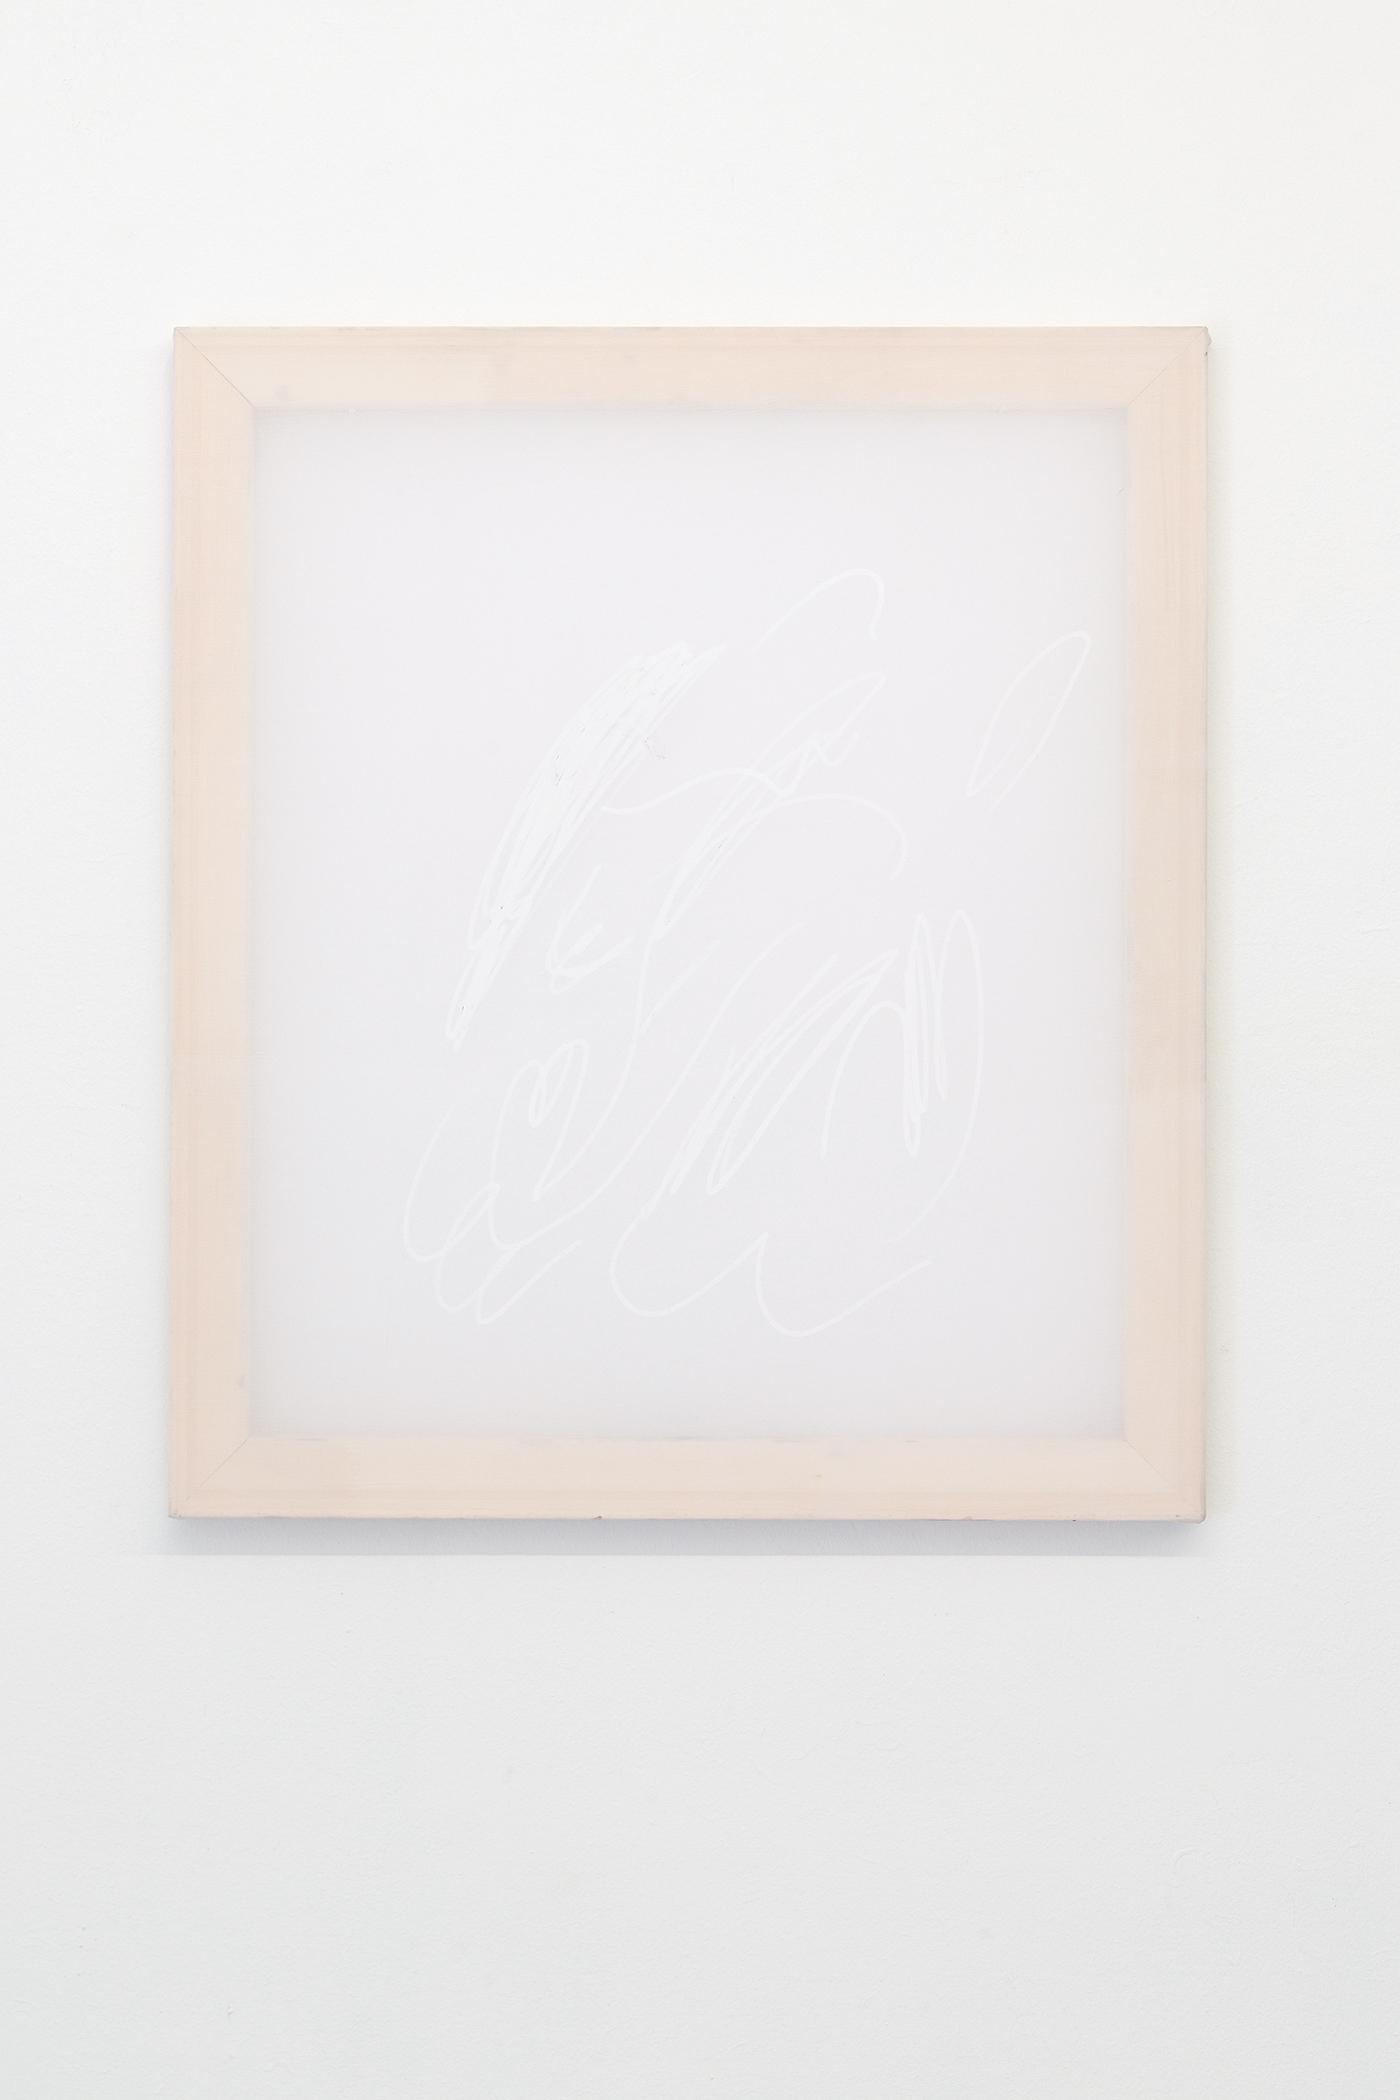 Alina Vergnano,  Soft Memory,  2019, acrylic on polyester, 80 x 90 cm